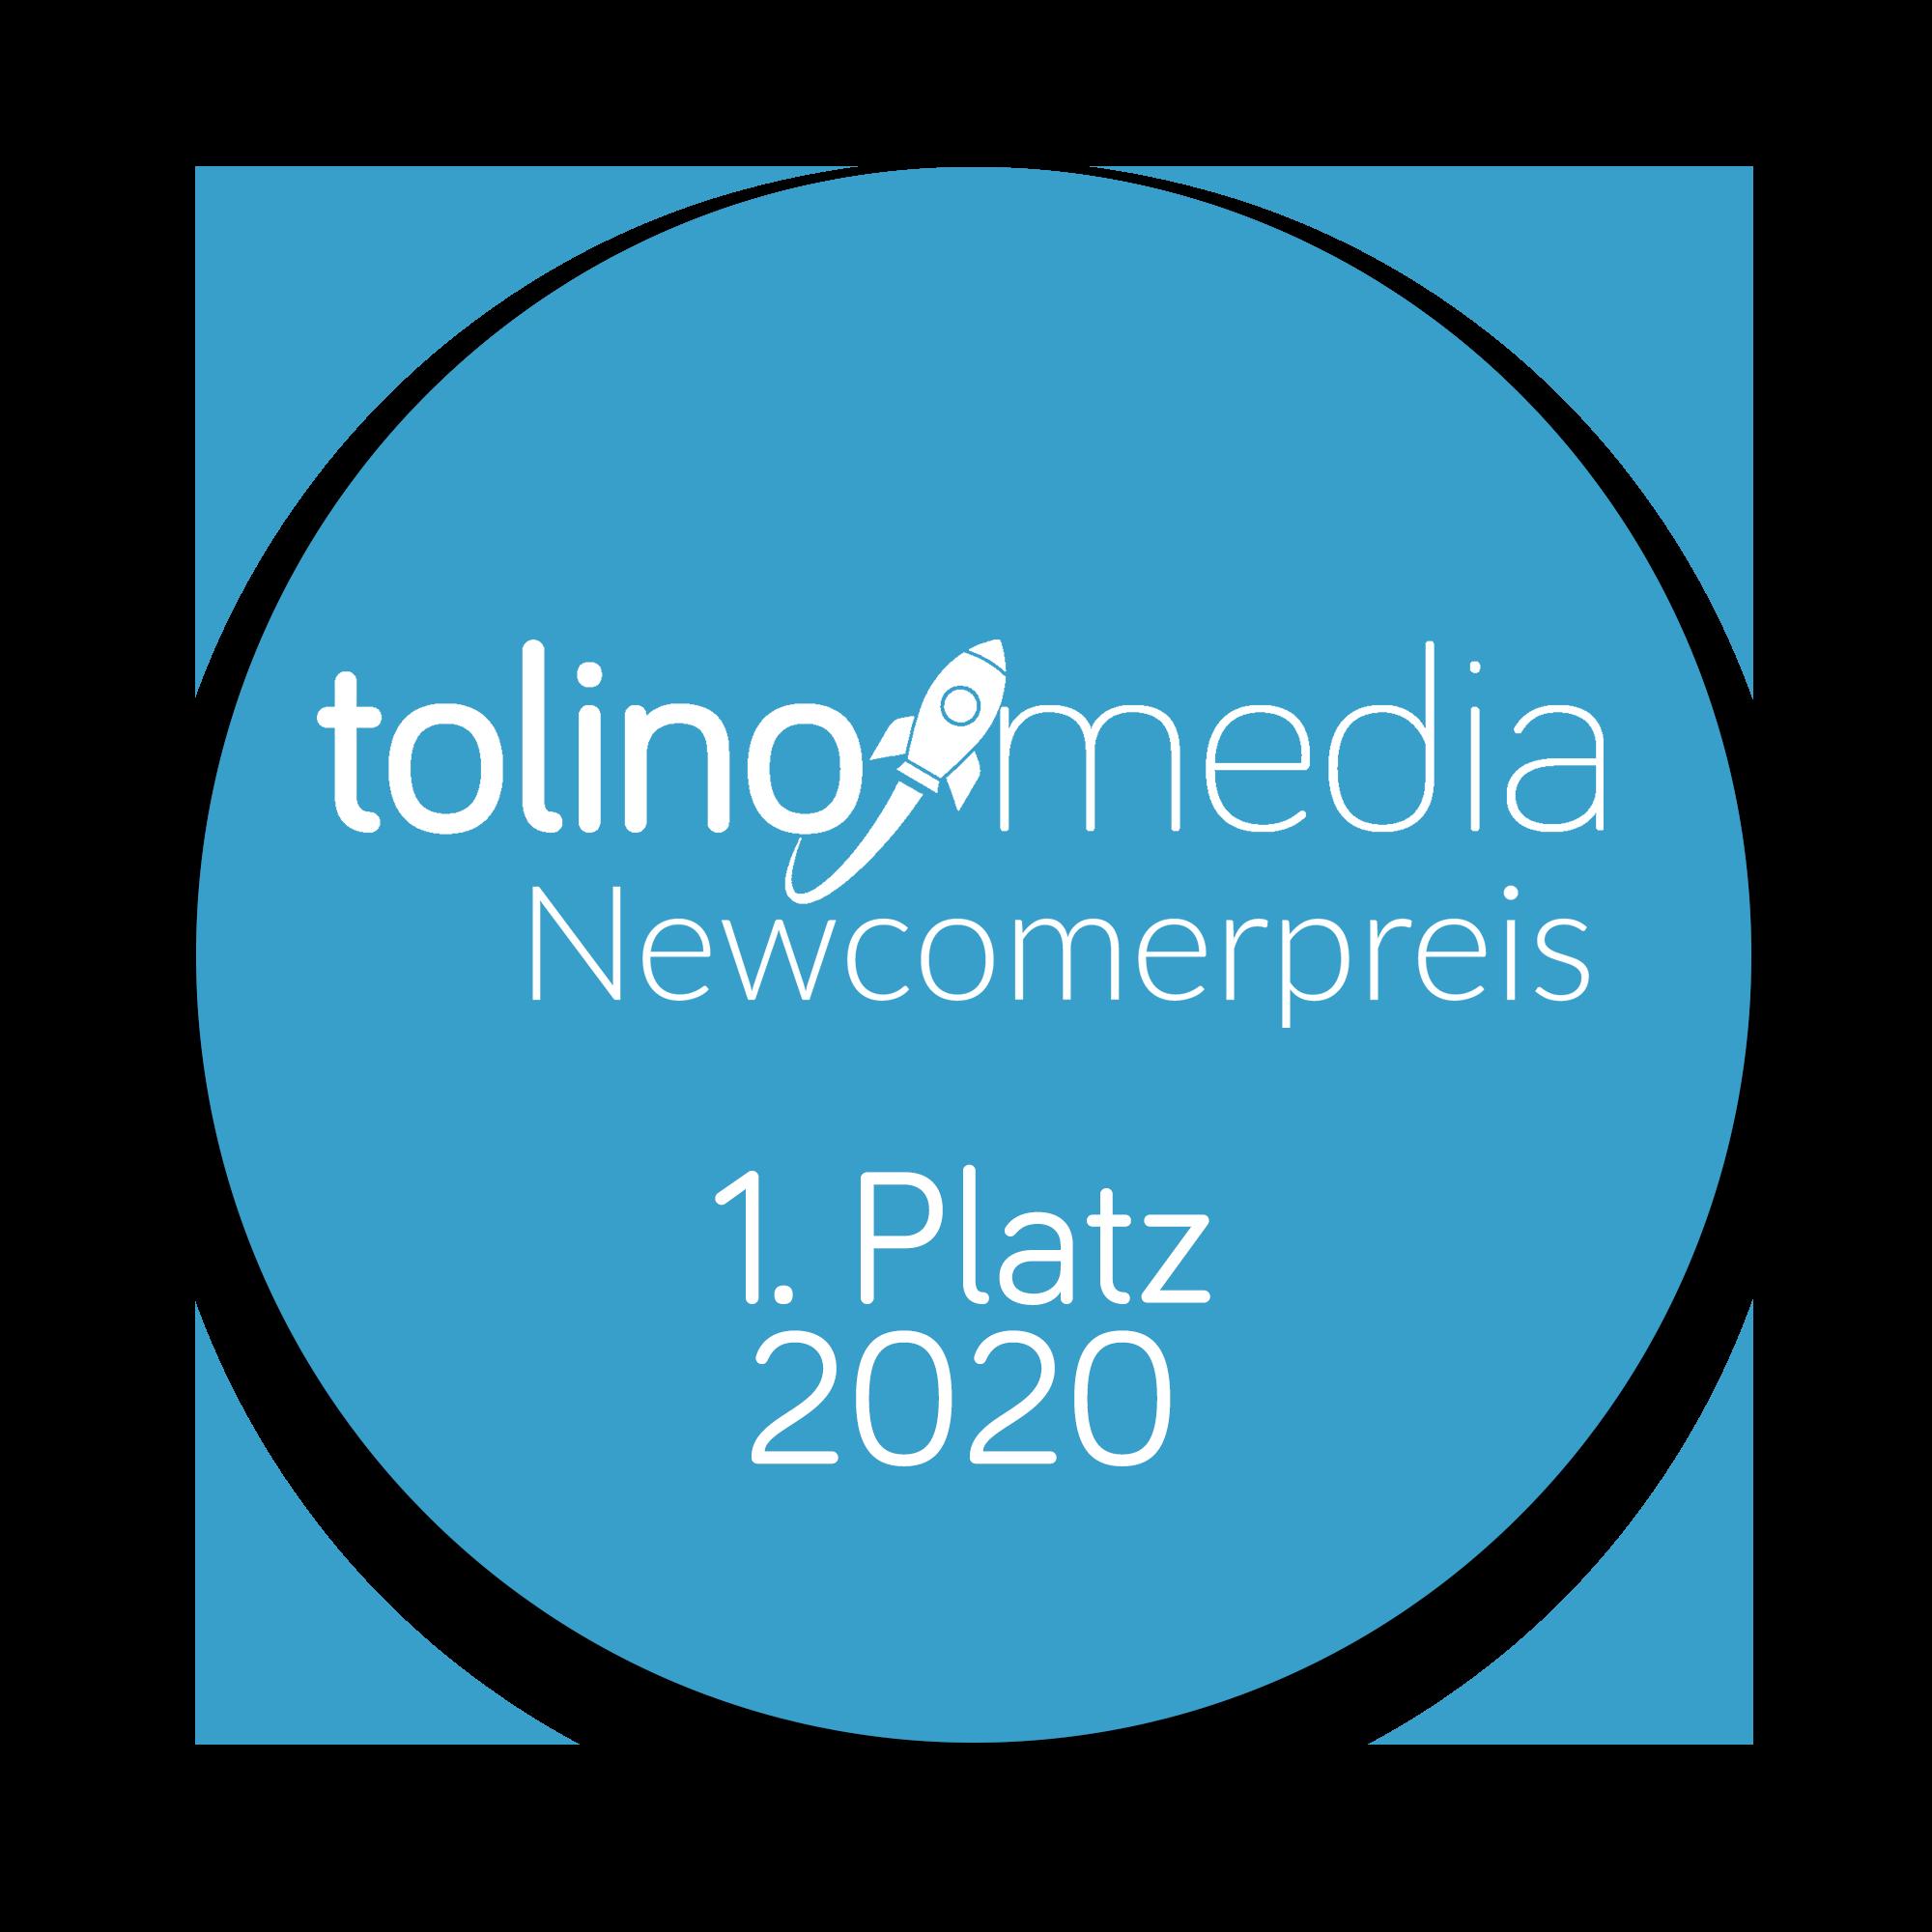 1. Platz beim tolino media Newcomerpreis 2020